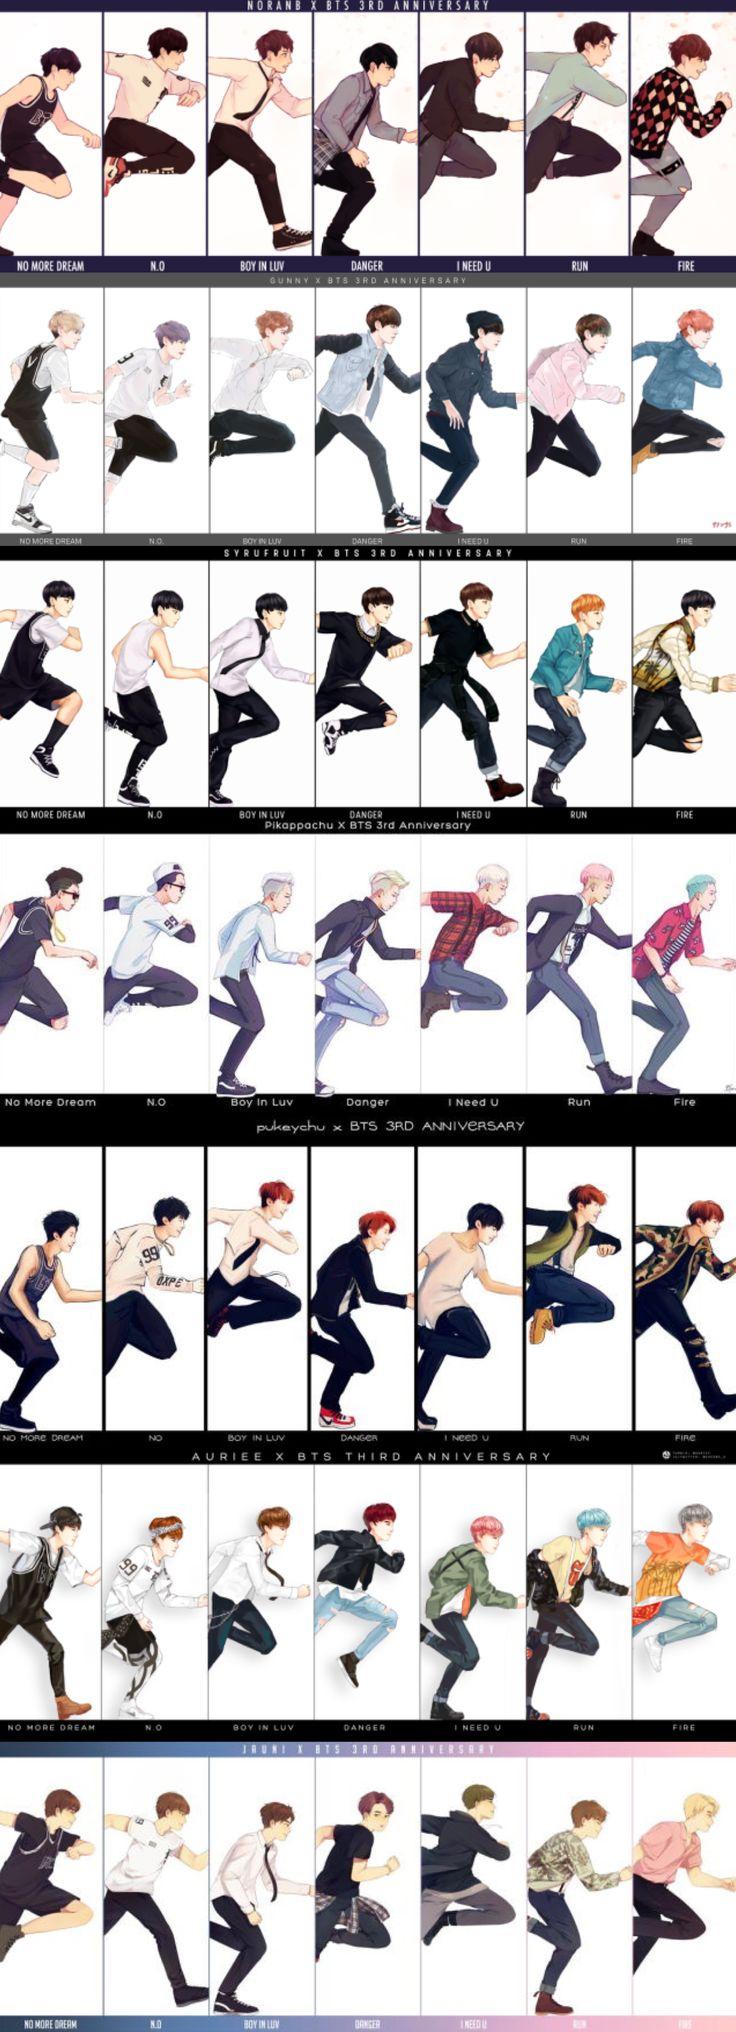 BTS grow up fan-art tumblr